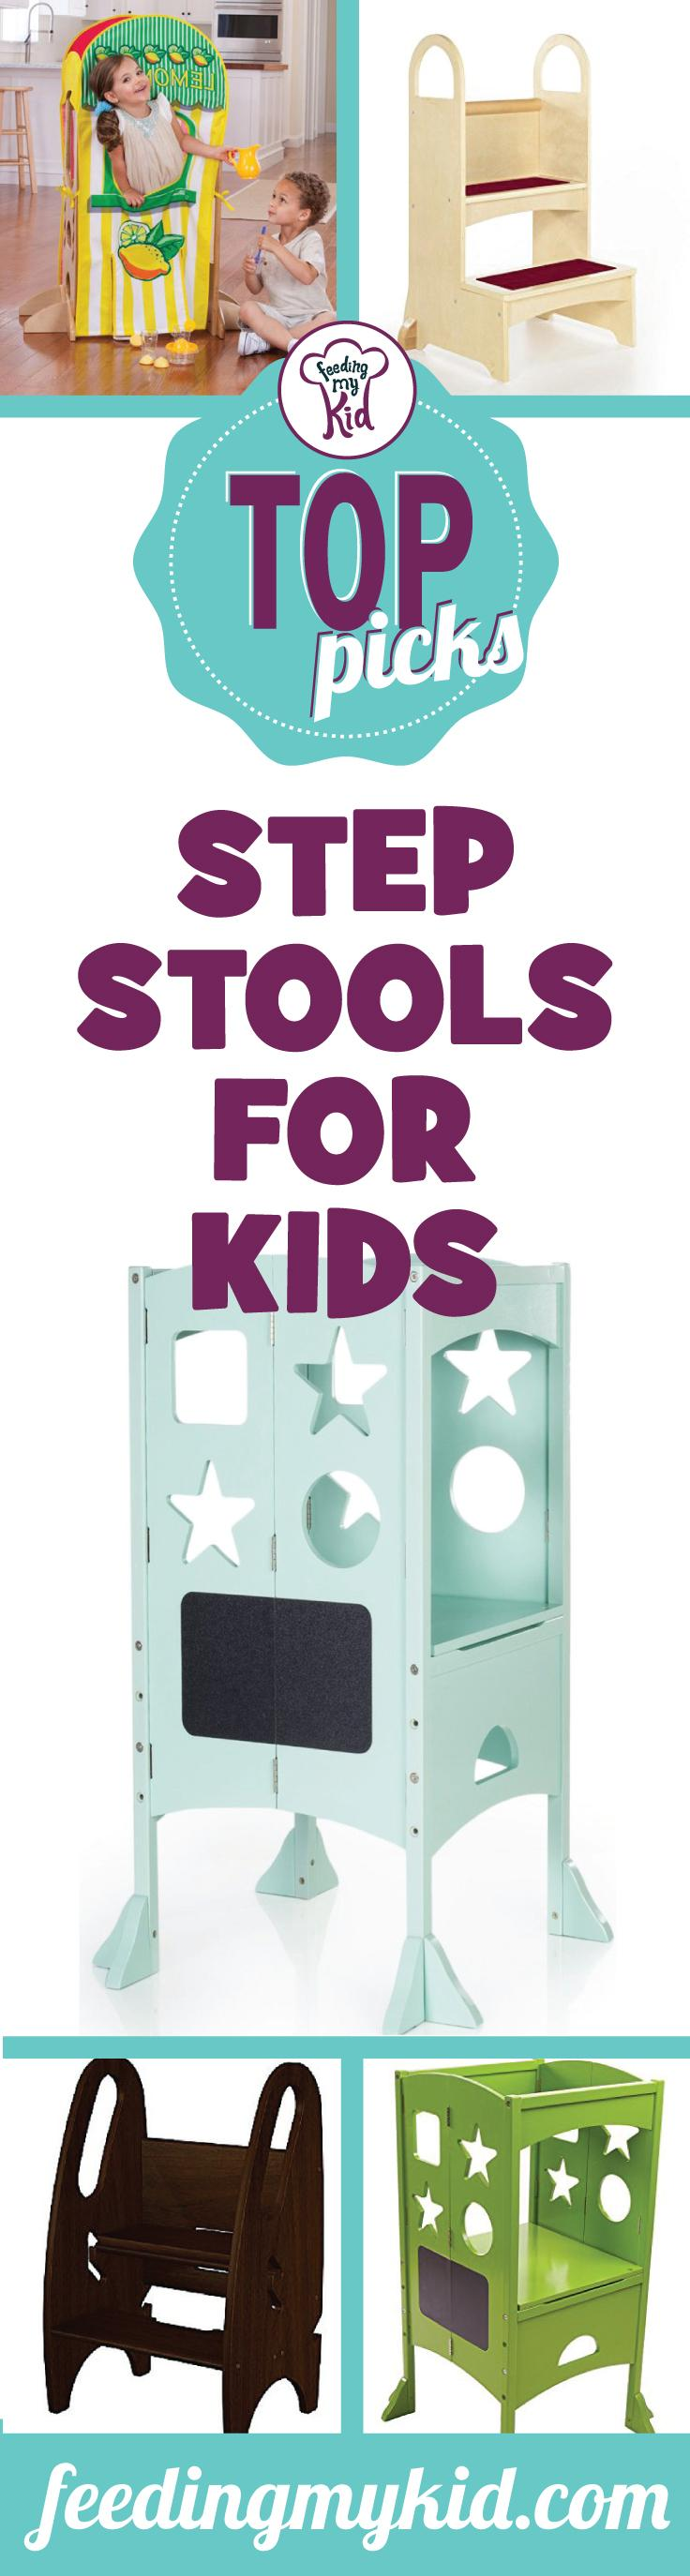 Top Picks: Step Stools for Kids